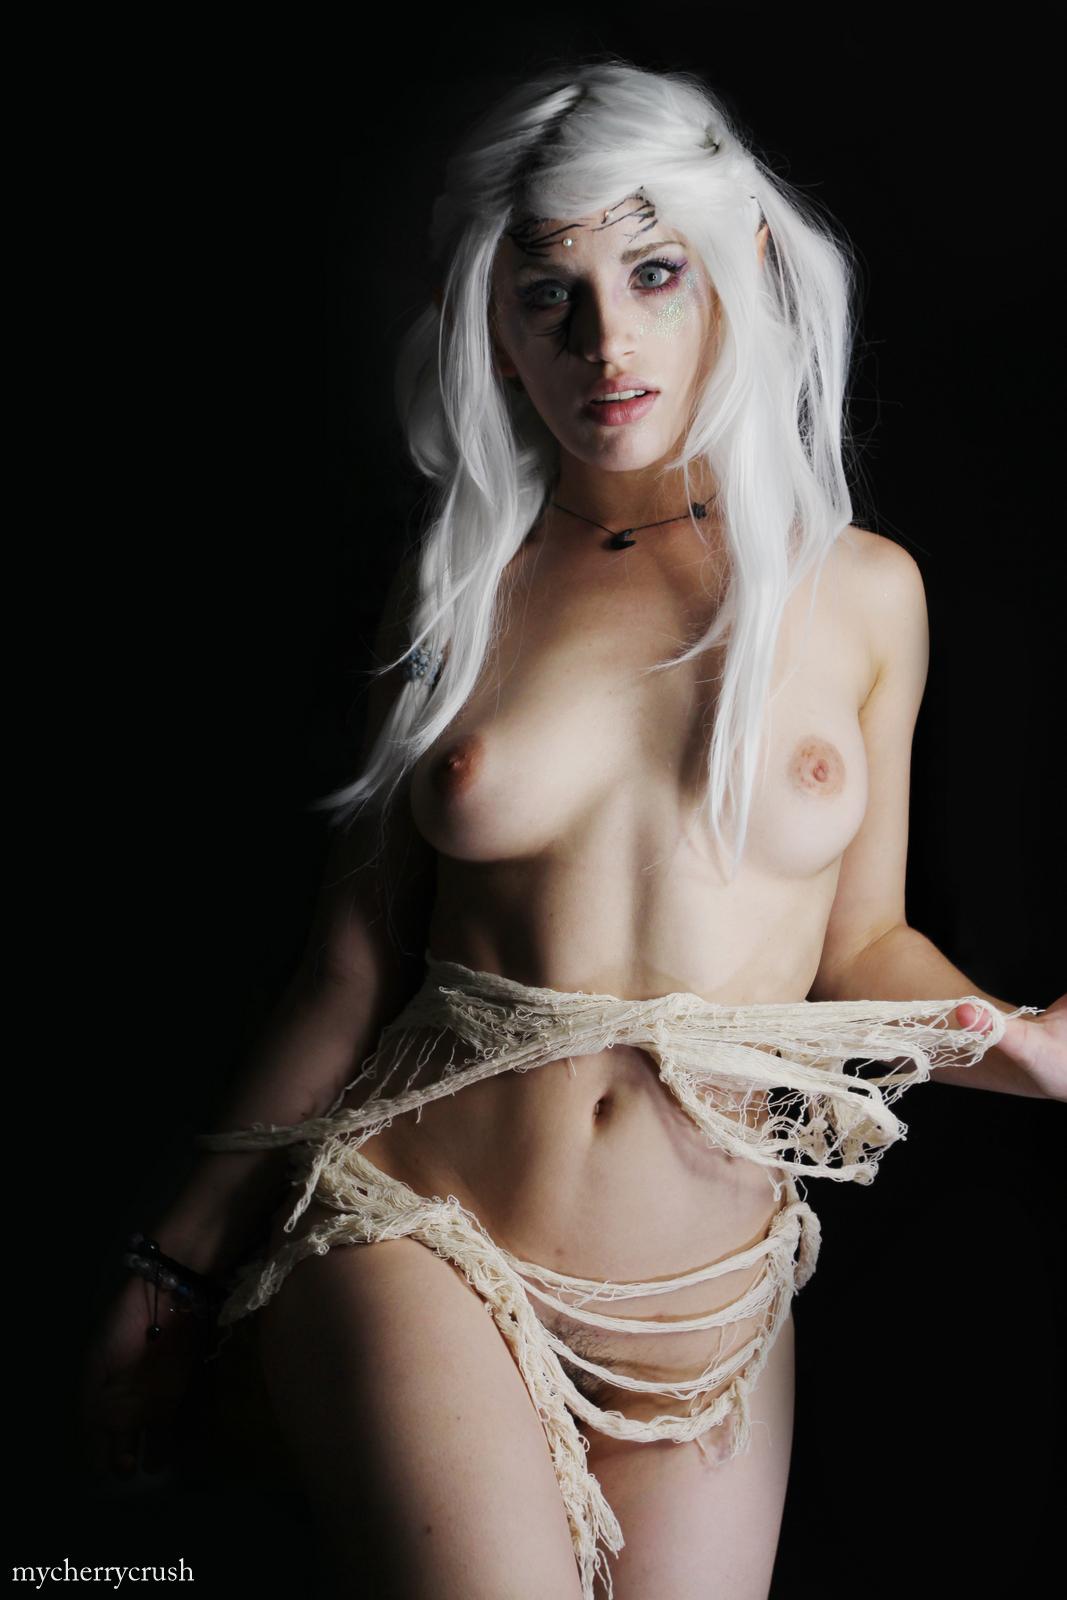 Mycherrycrush nude